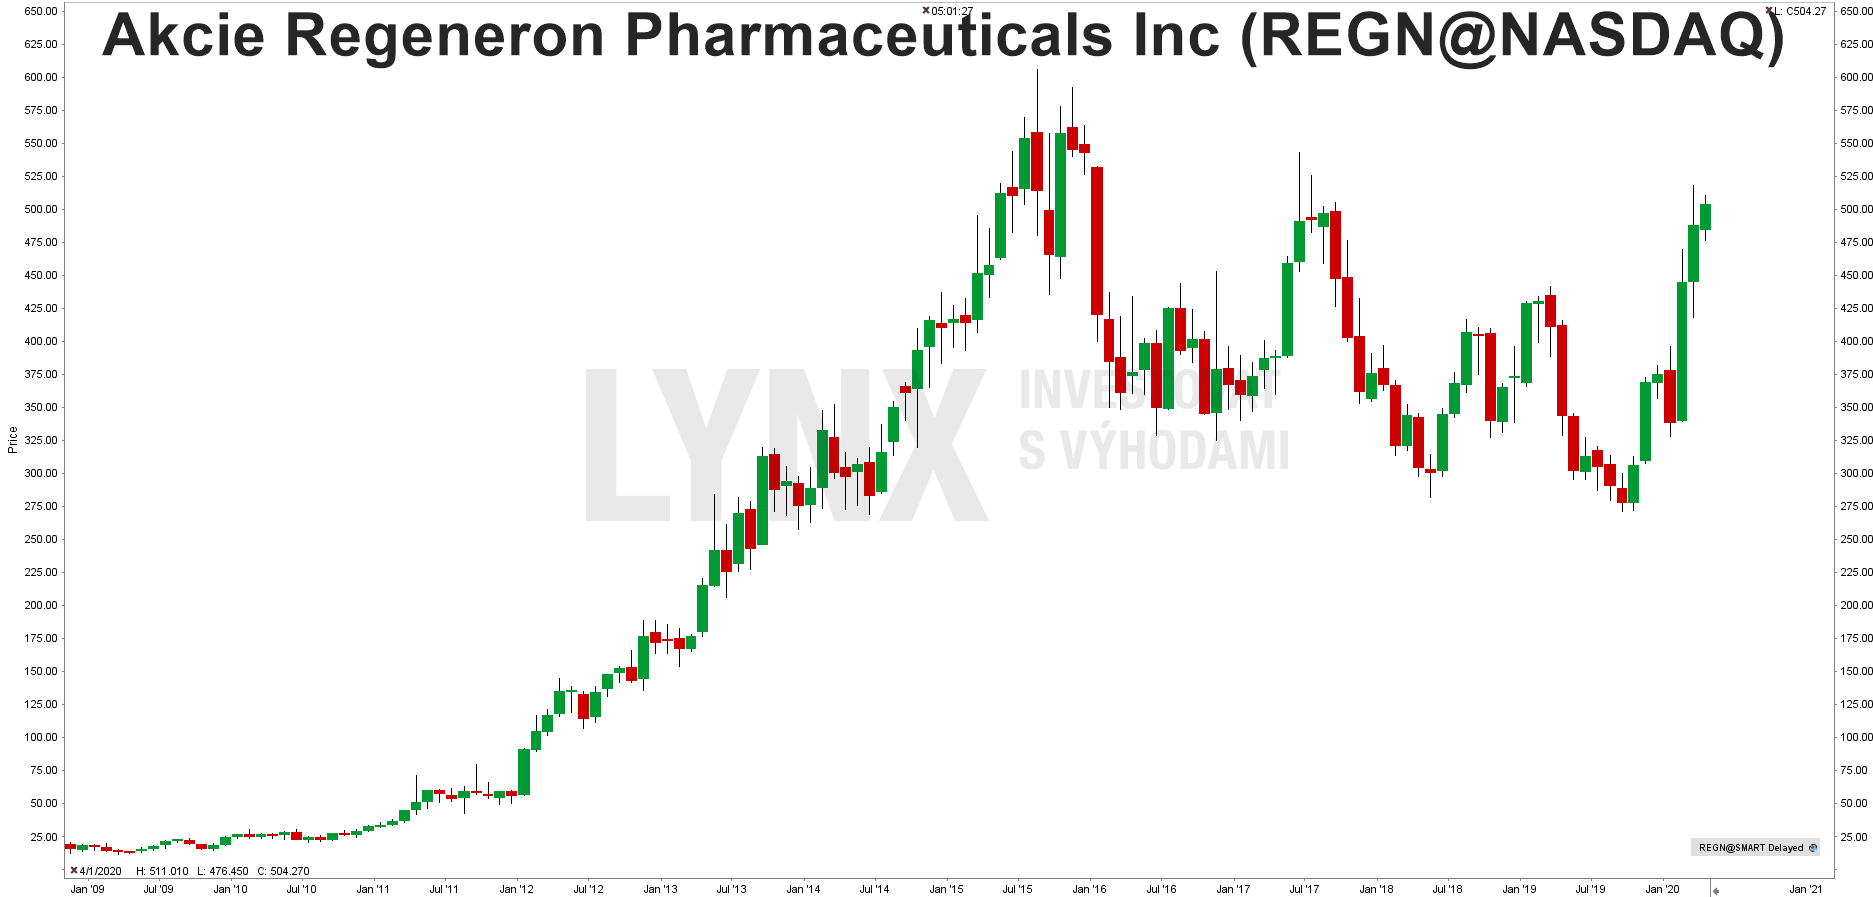 Graf akcie Regeneron Pharmaceutical (REGN)